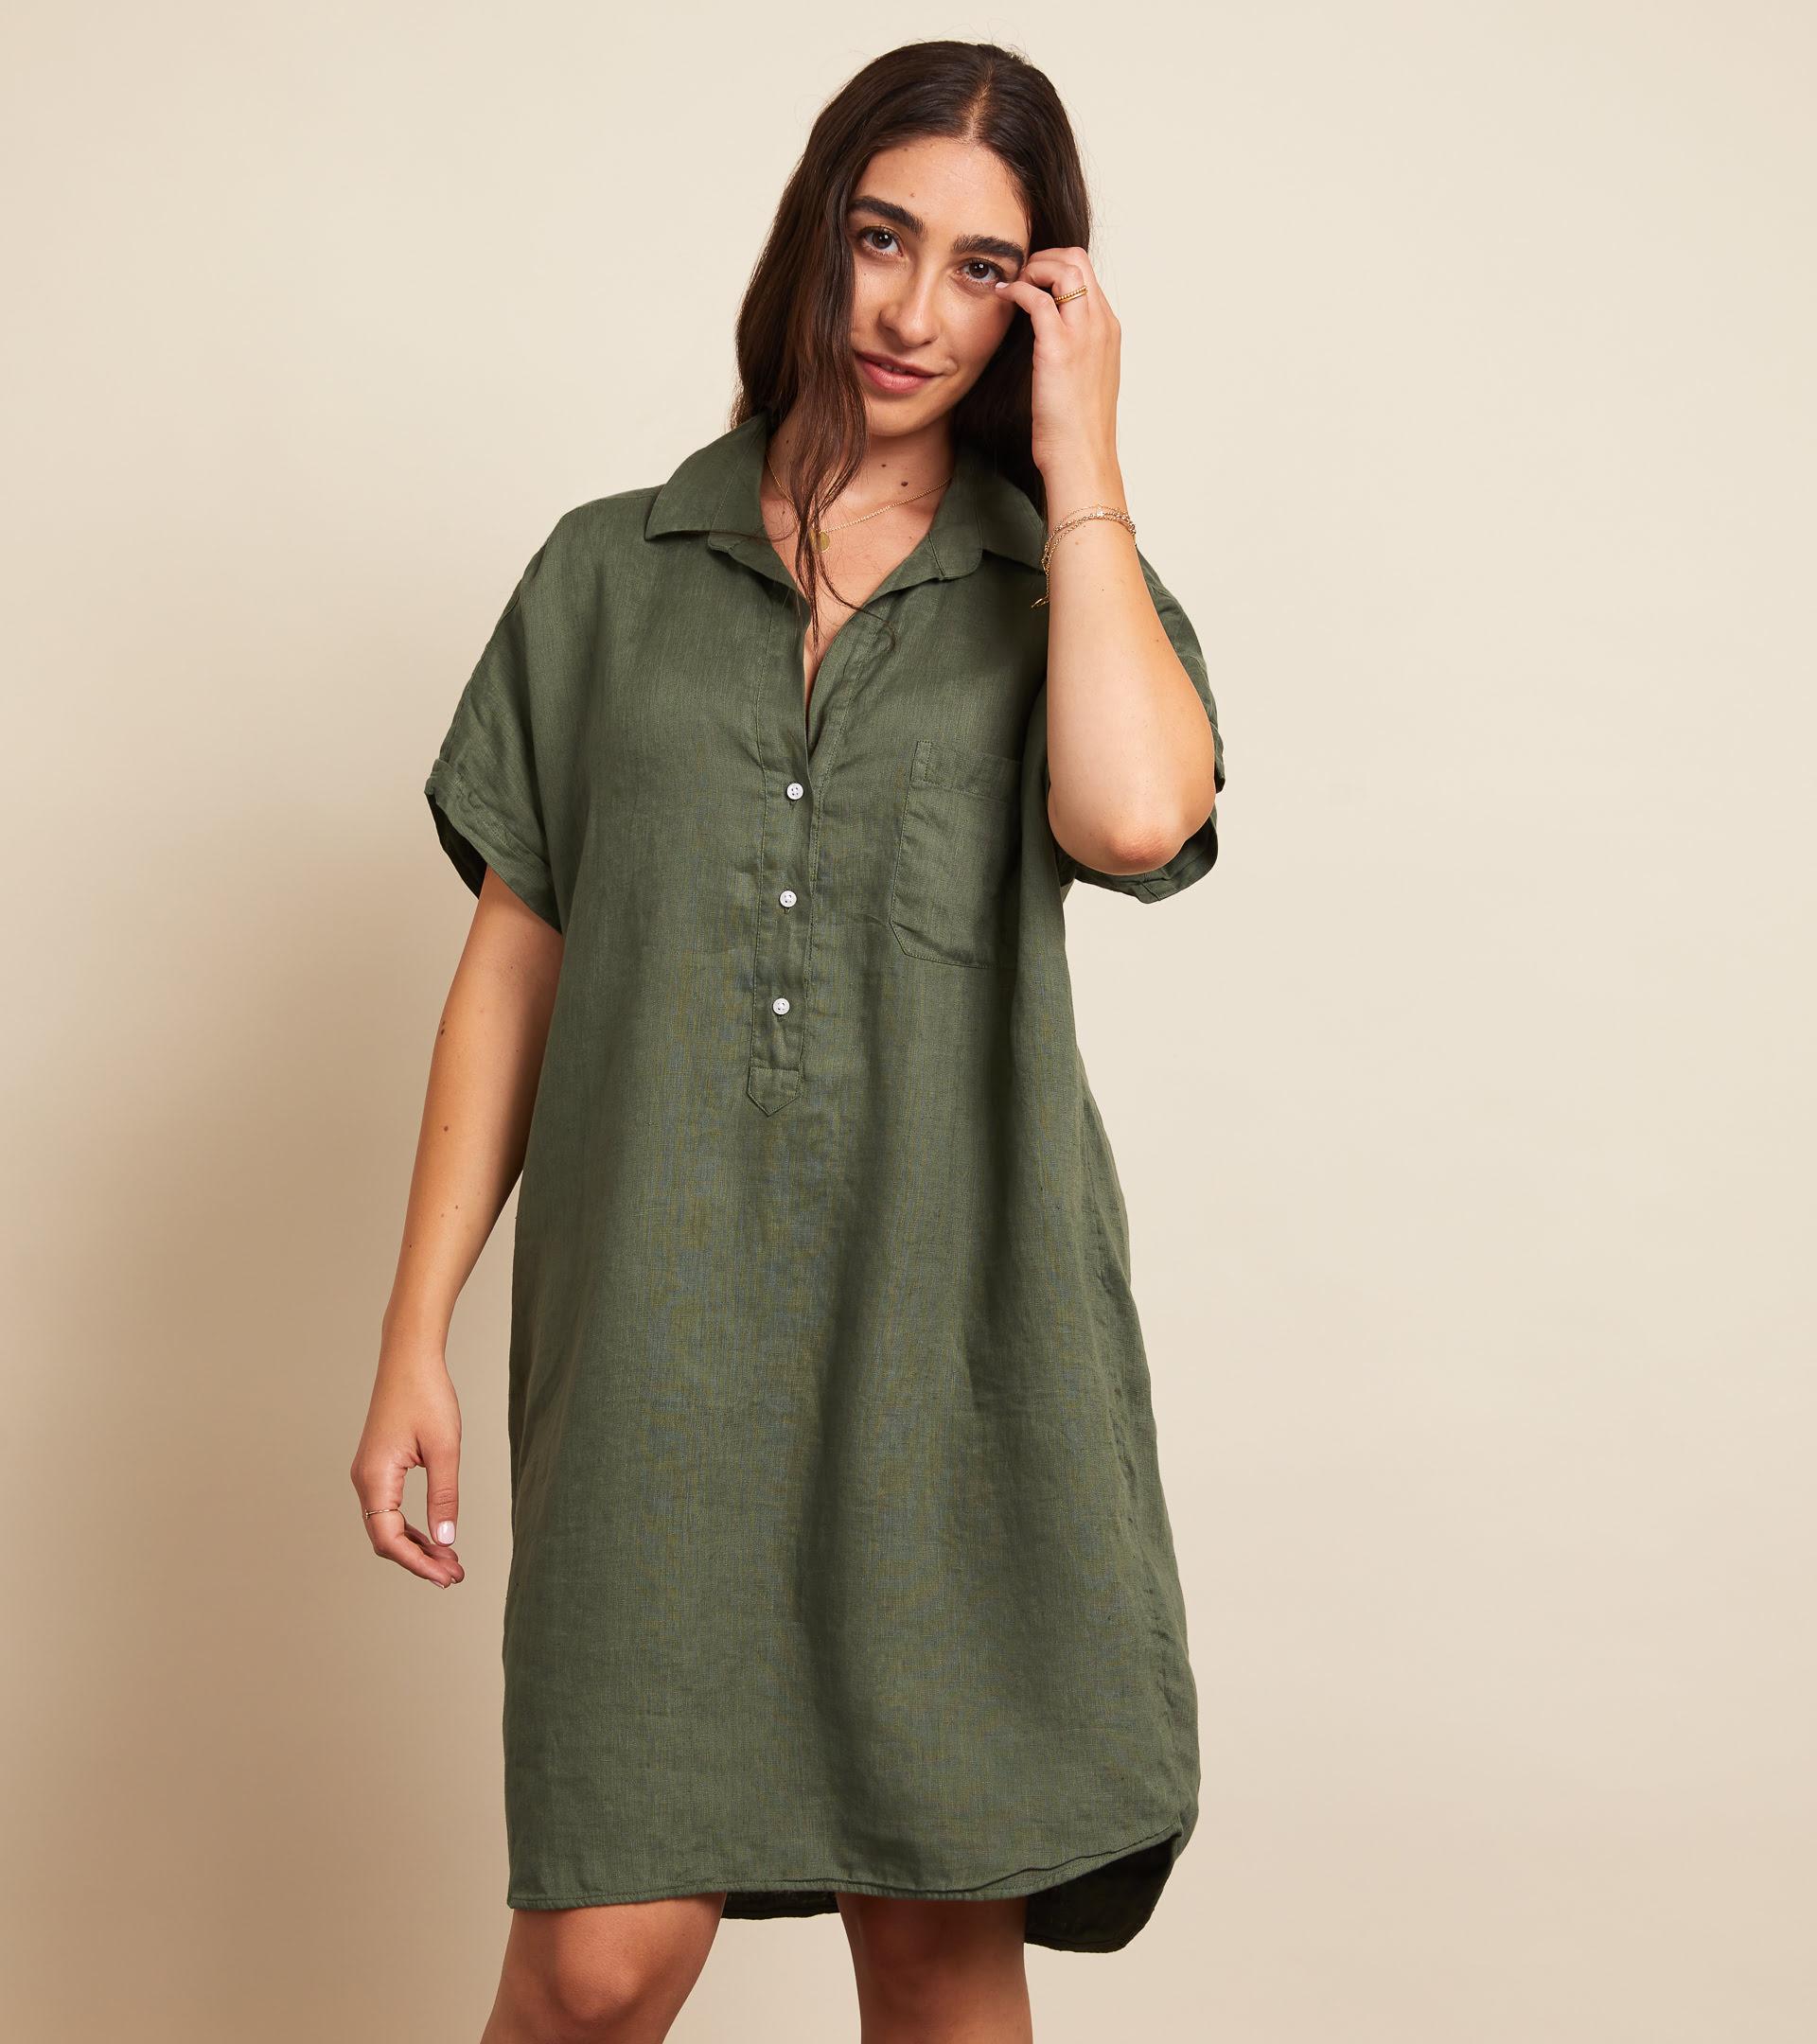 The Artist Short Sleeve Dress Army Green, Tumbled Linen Final Sale view 2